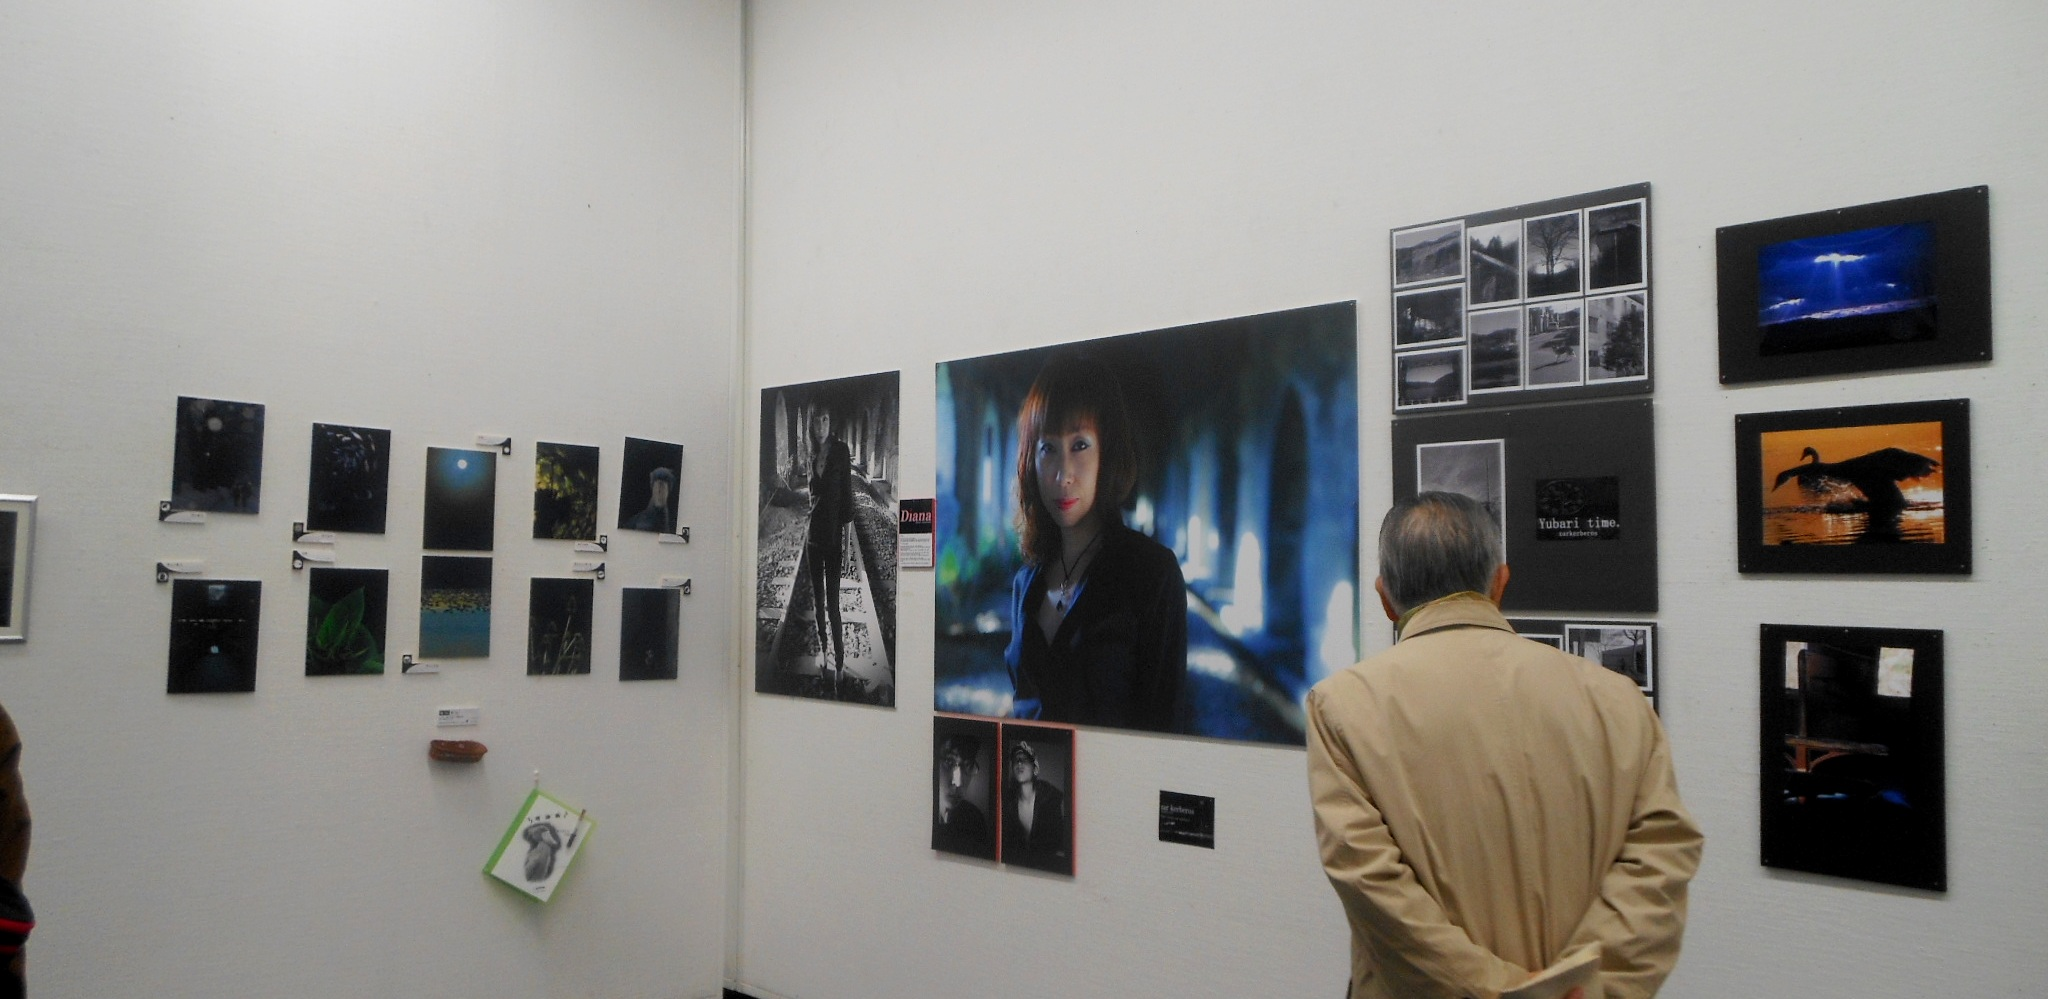 1888)③「写真クラブ「BePHaT!!」 第9回作品展 『夢 Photo 2012』」市民g. 終了11月21日(水)~11月25日(日)_f0126829_23545657.jpg